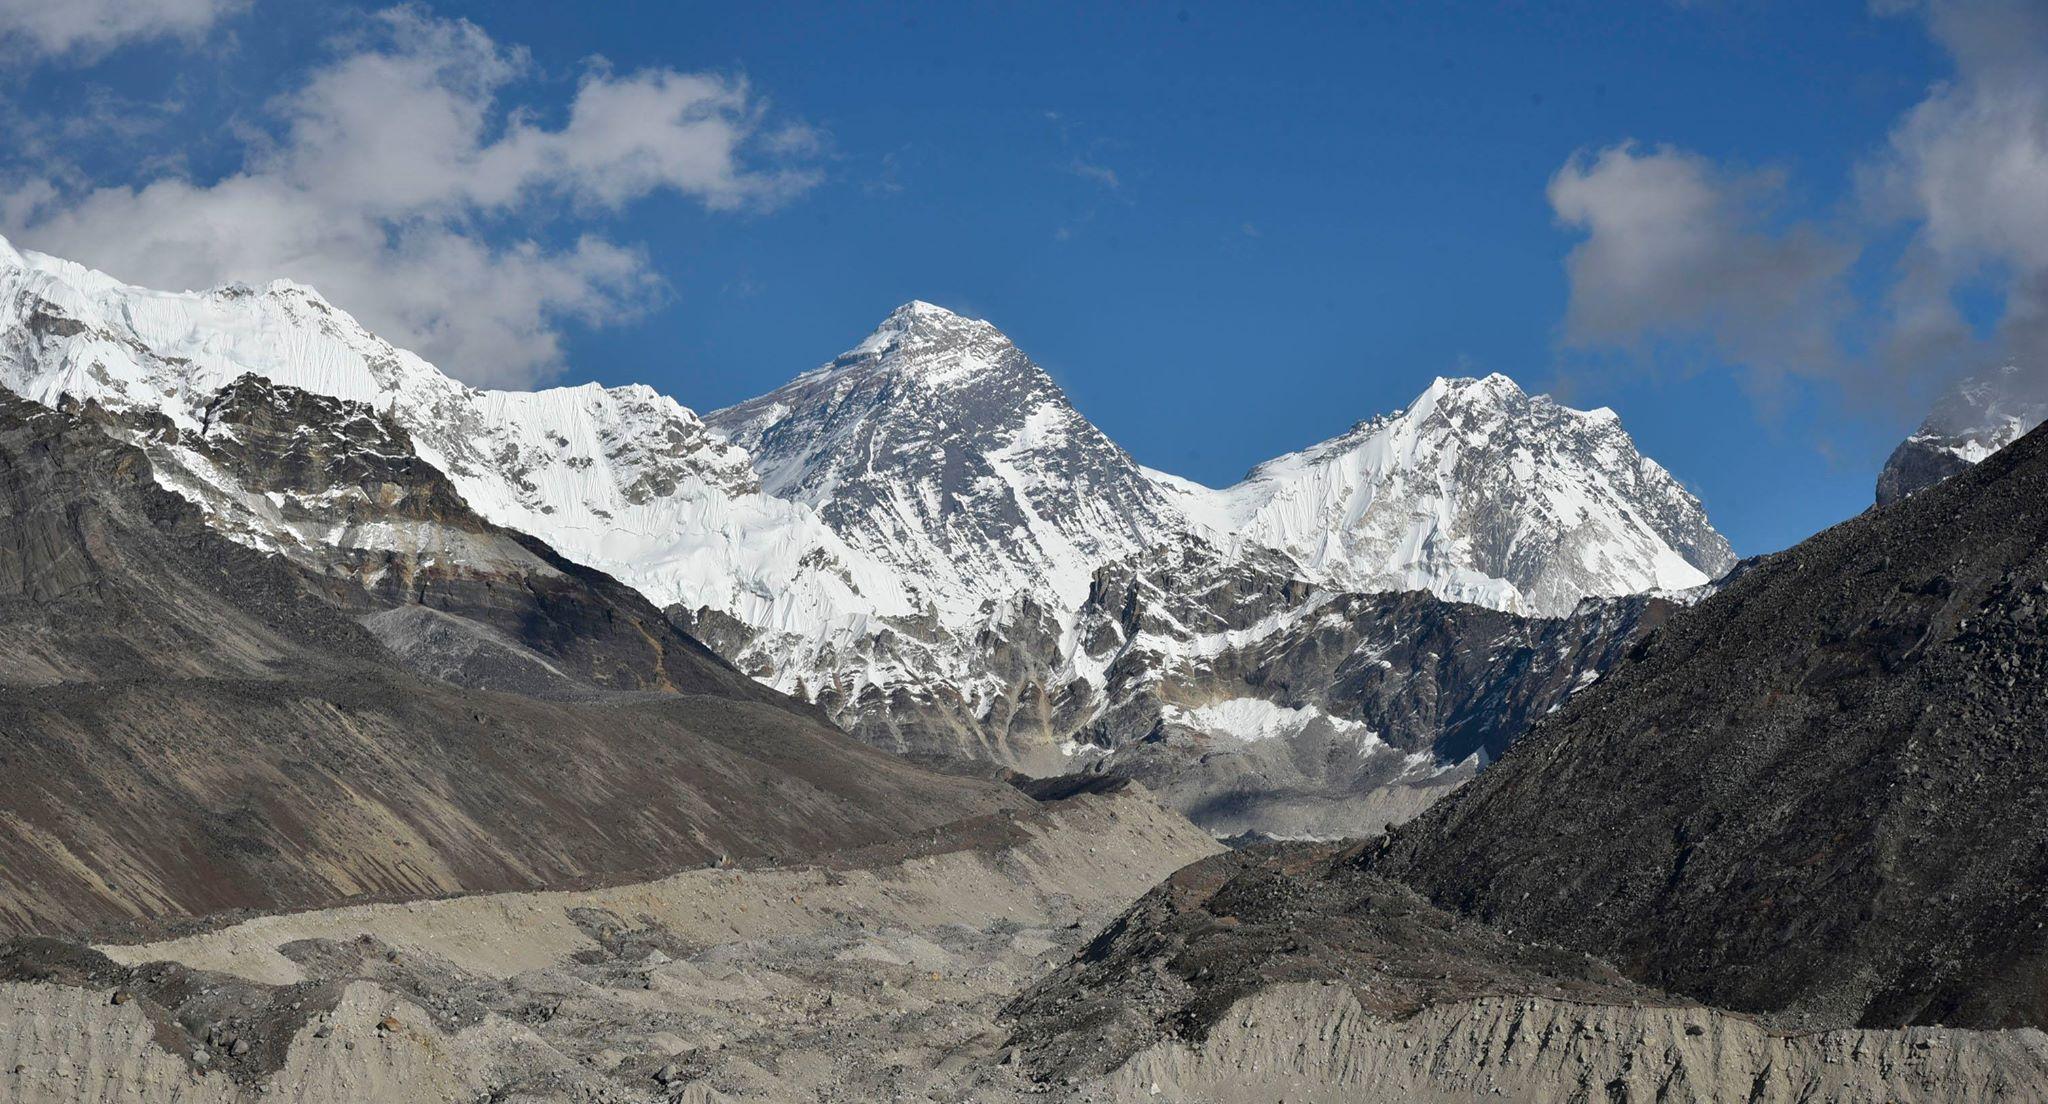 View of Mt. Everest with khumbu Glacier